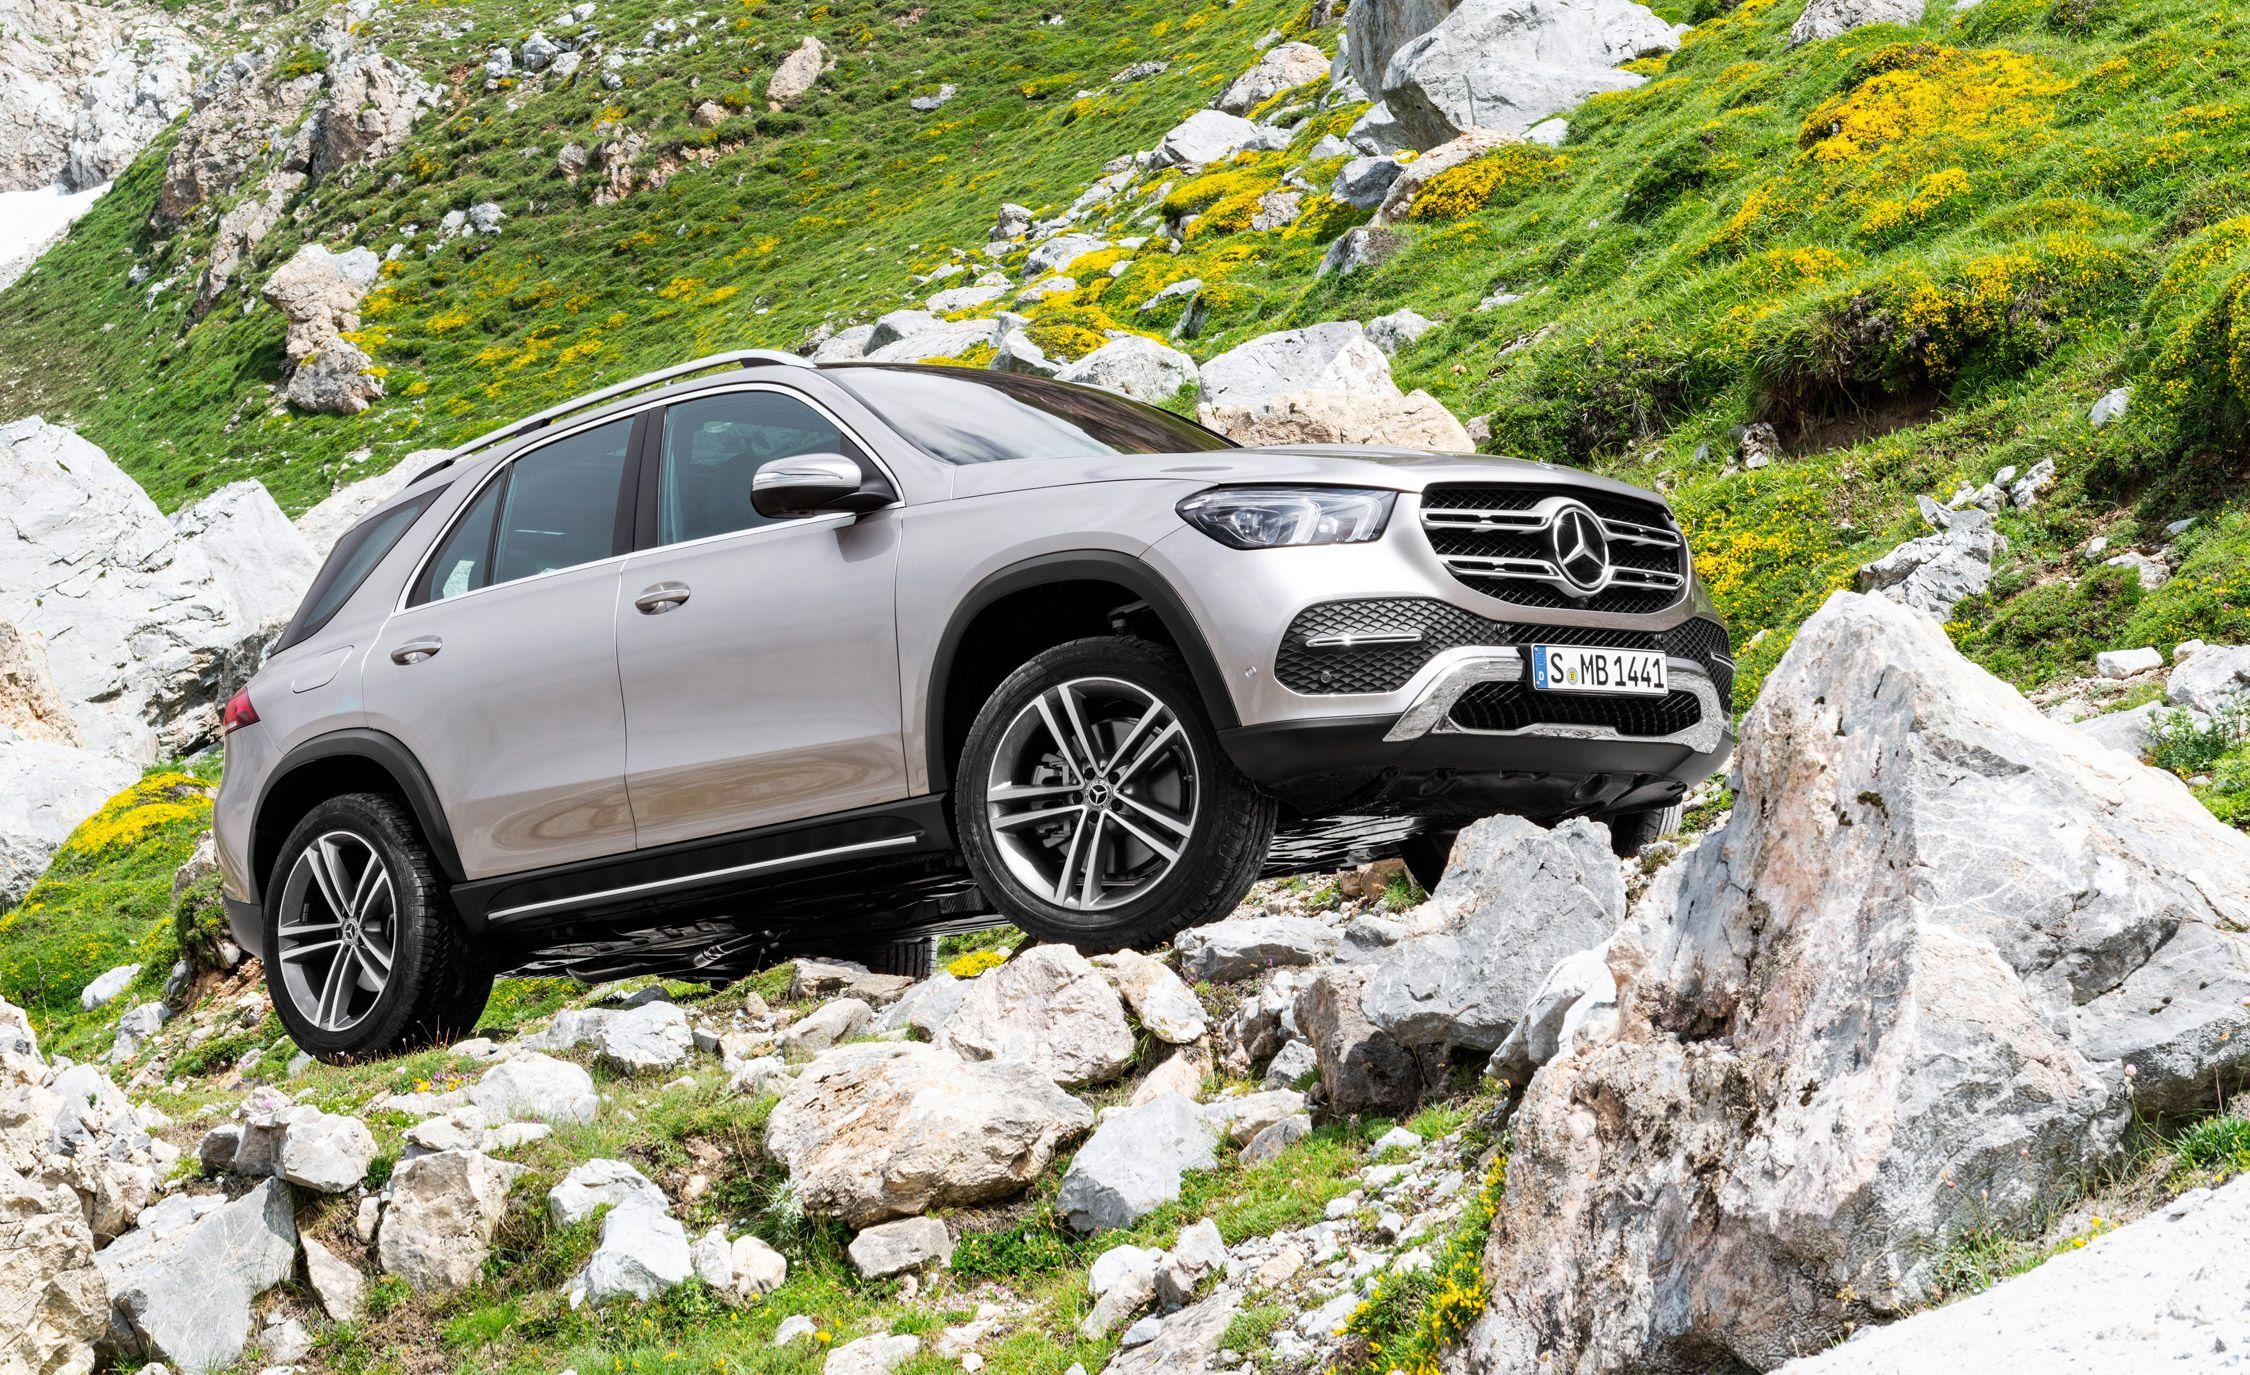 2020 Mercedes Benz Gle Class Photos And Info